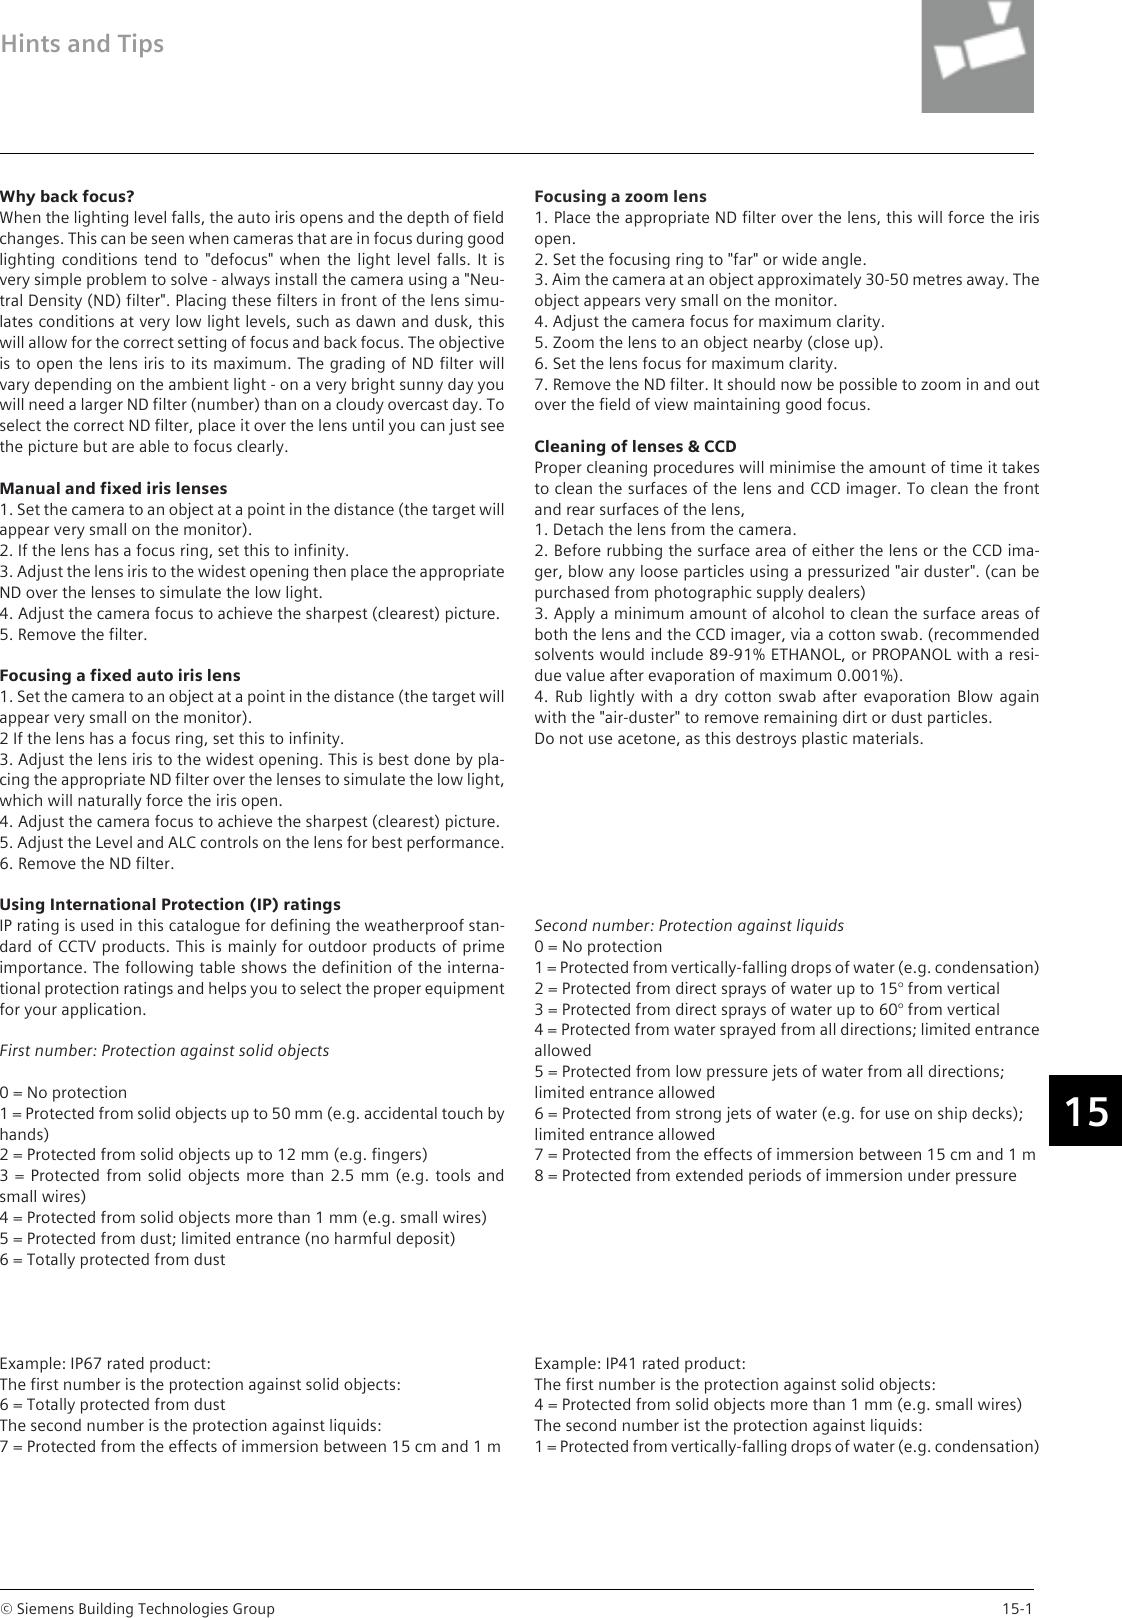 Siemens Crt Users Manual 01_cams